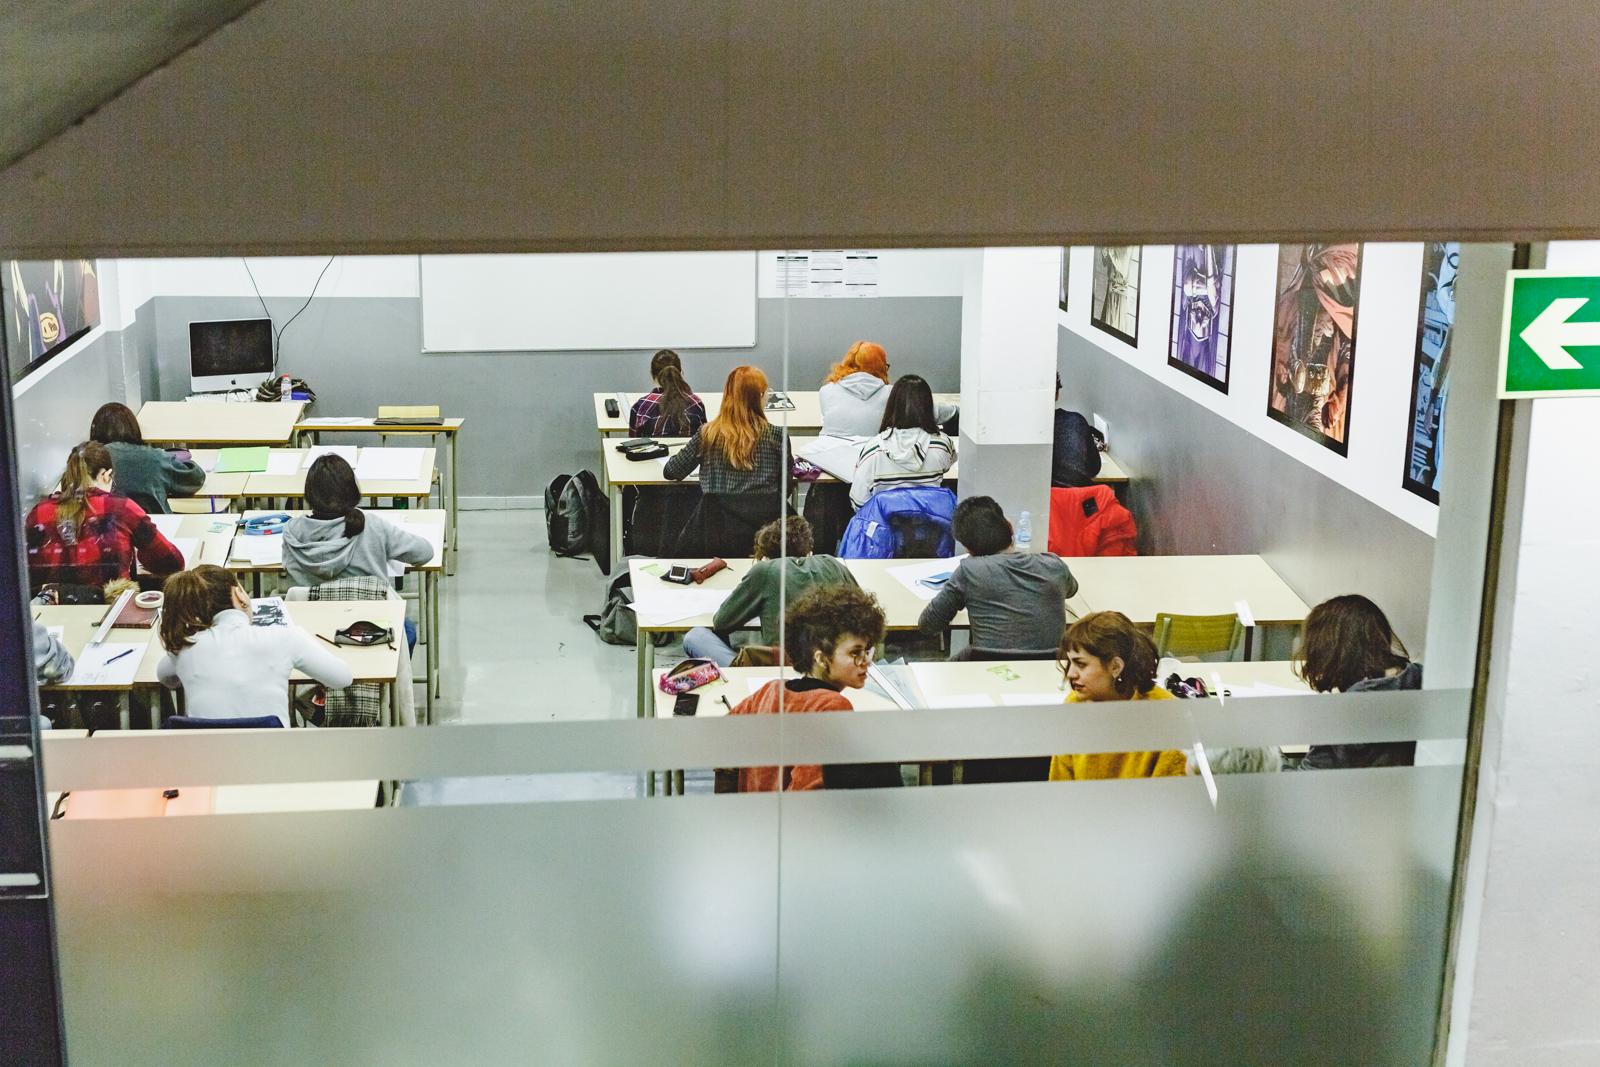 escuela-de-comic-joso-barcelona-fotografia-corporativa-misshappyflash-7.jpg